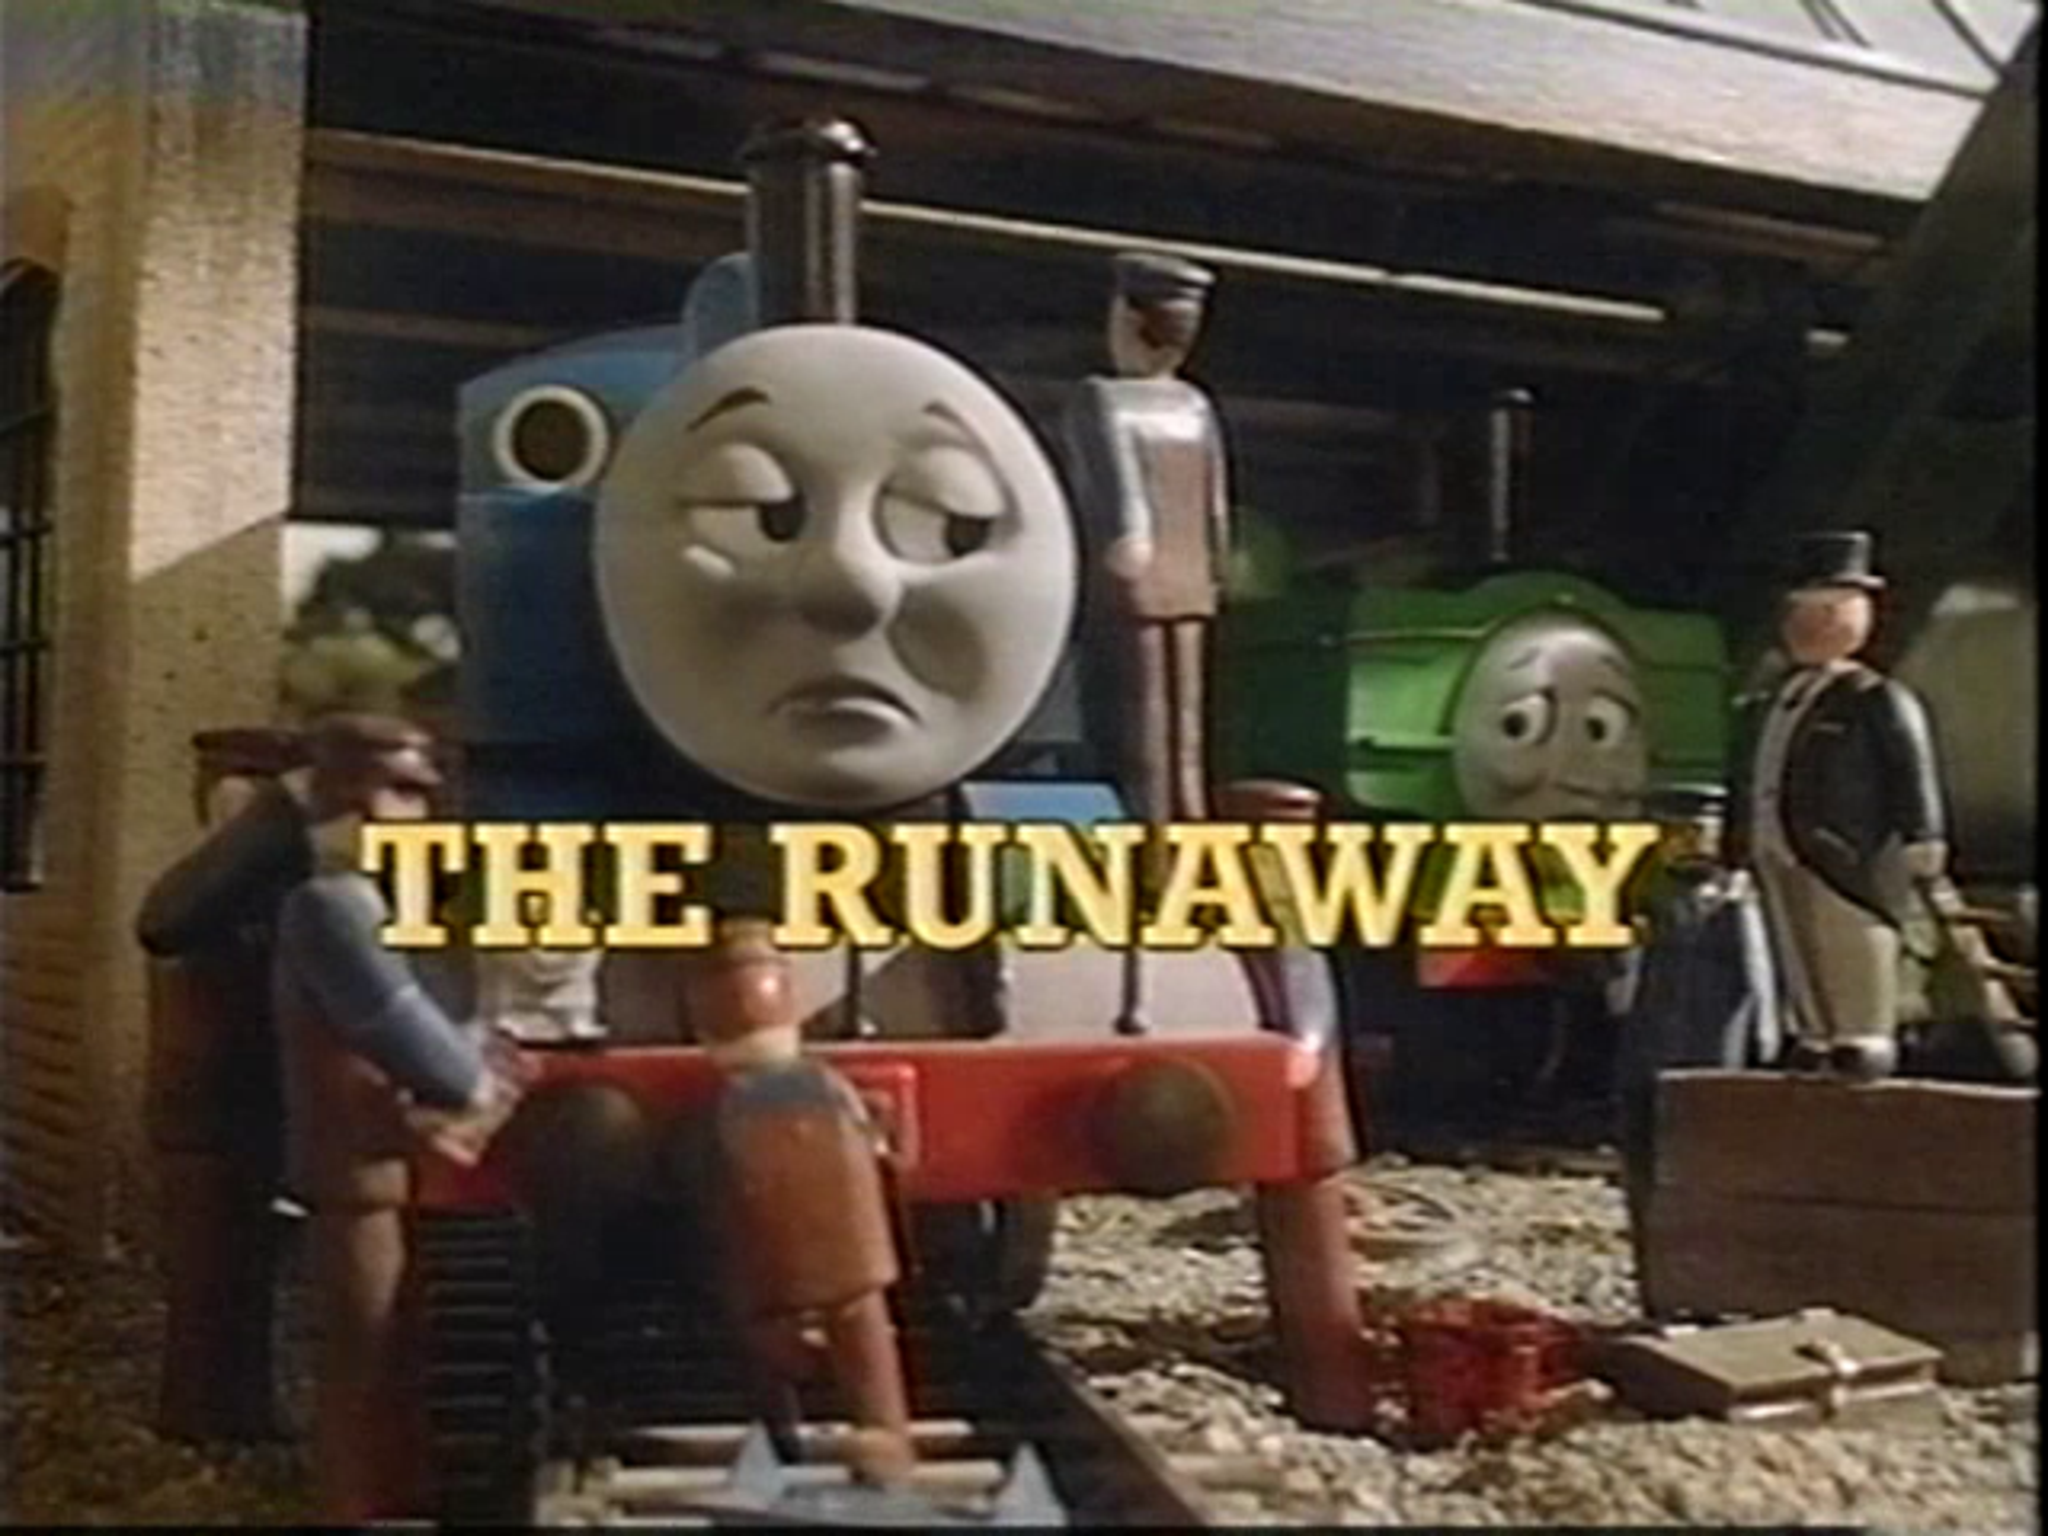 File:TheRunaway1993UStitlecard.png